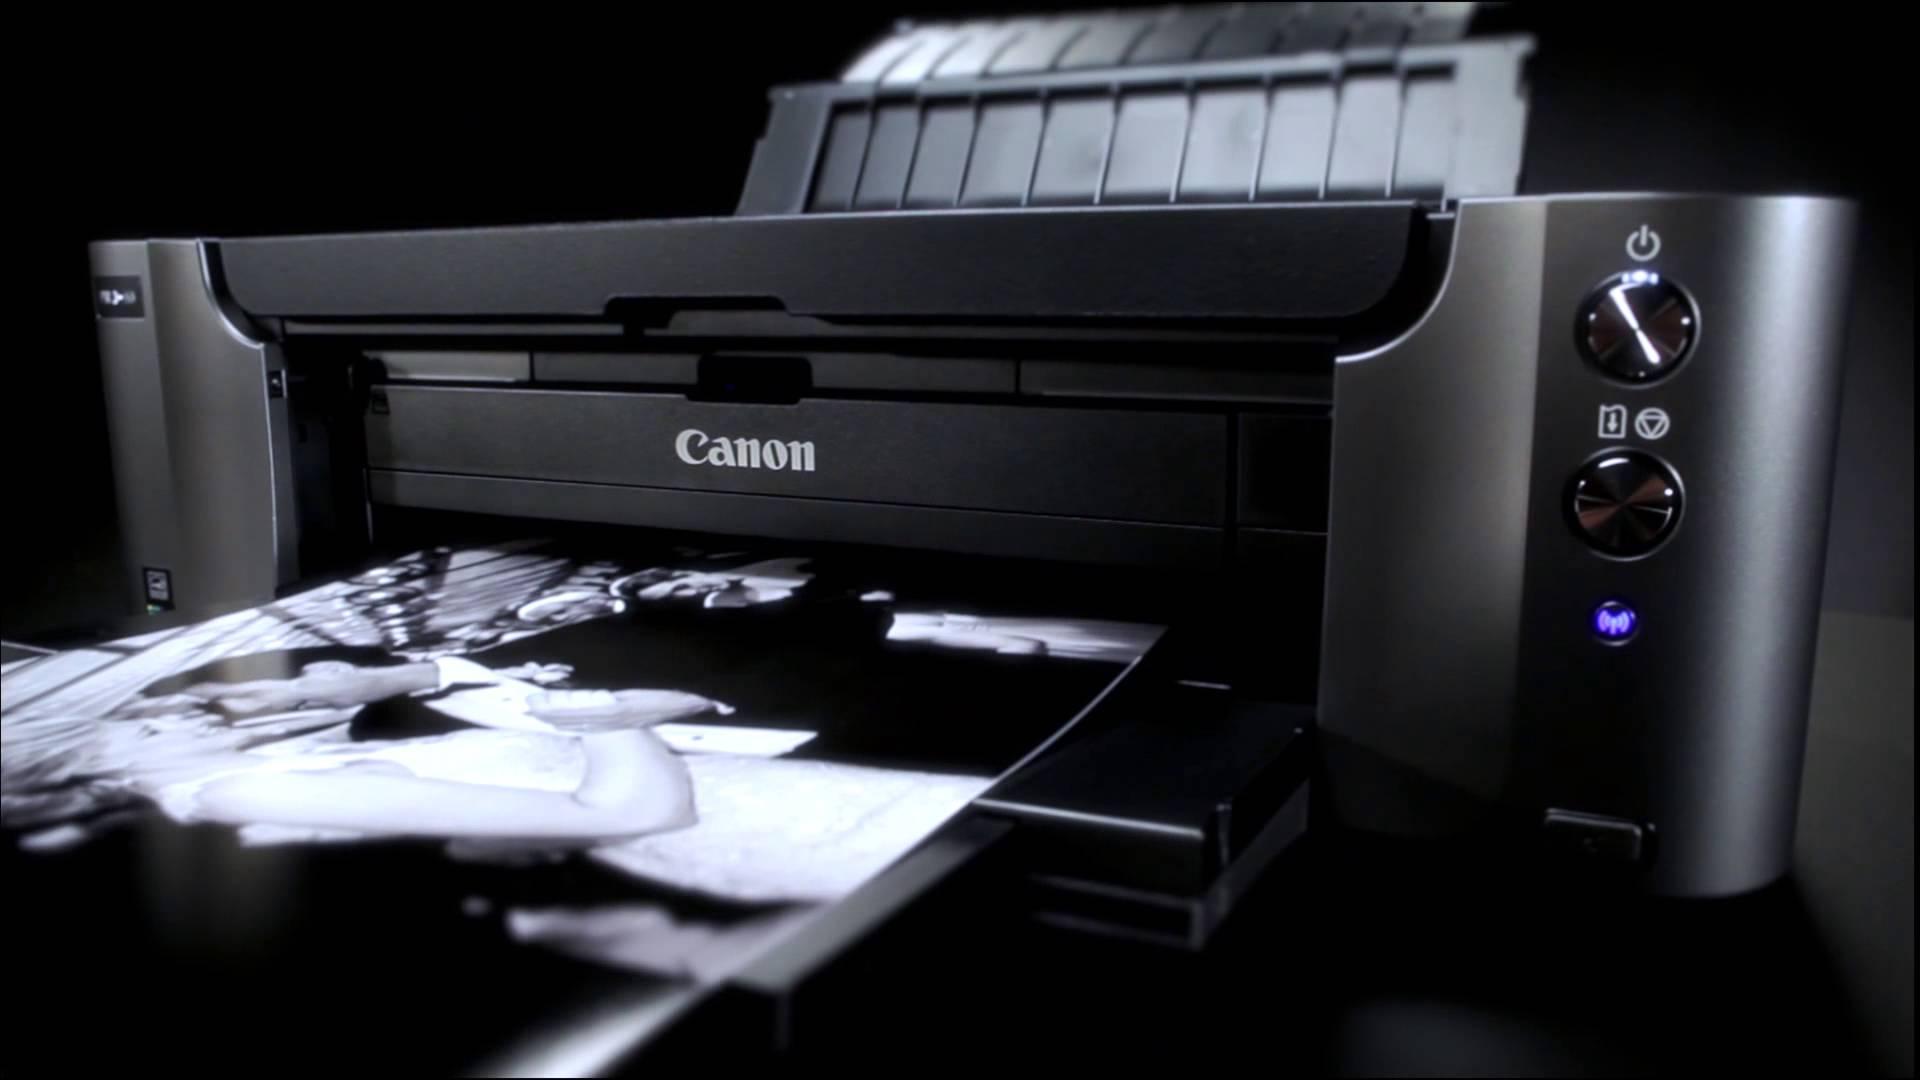 Canon Service Center | Authorised Doorstep Canon Printer Service